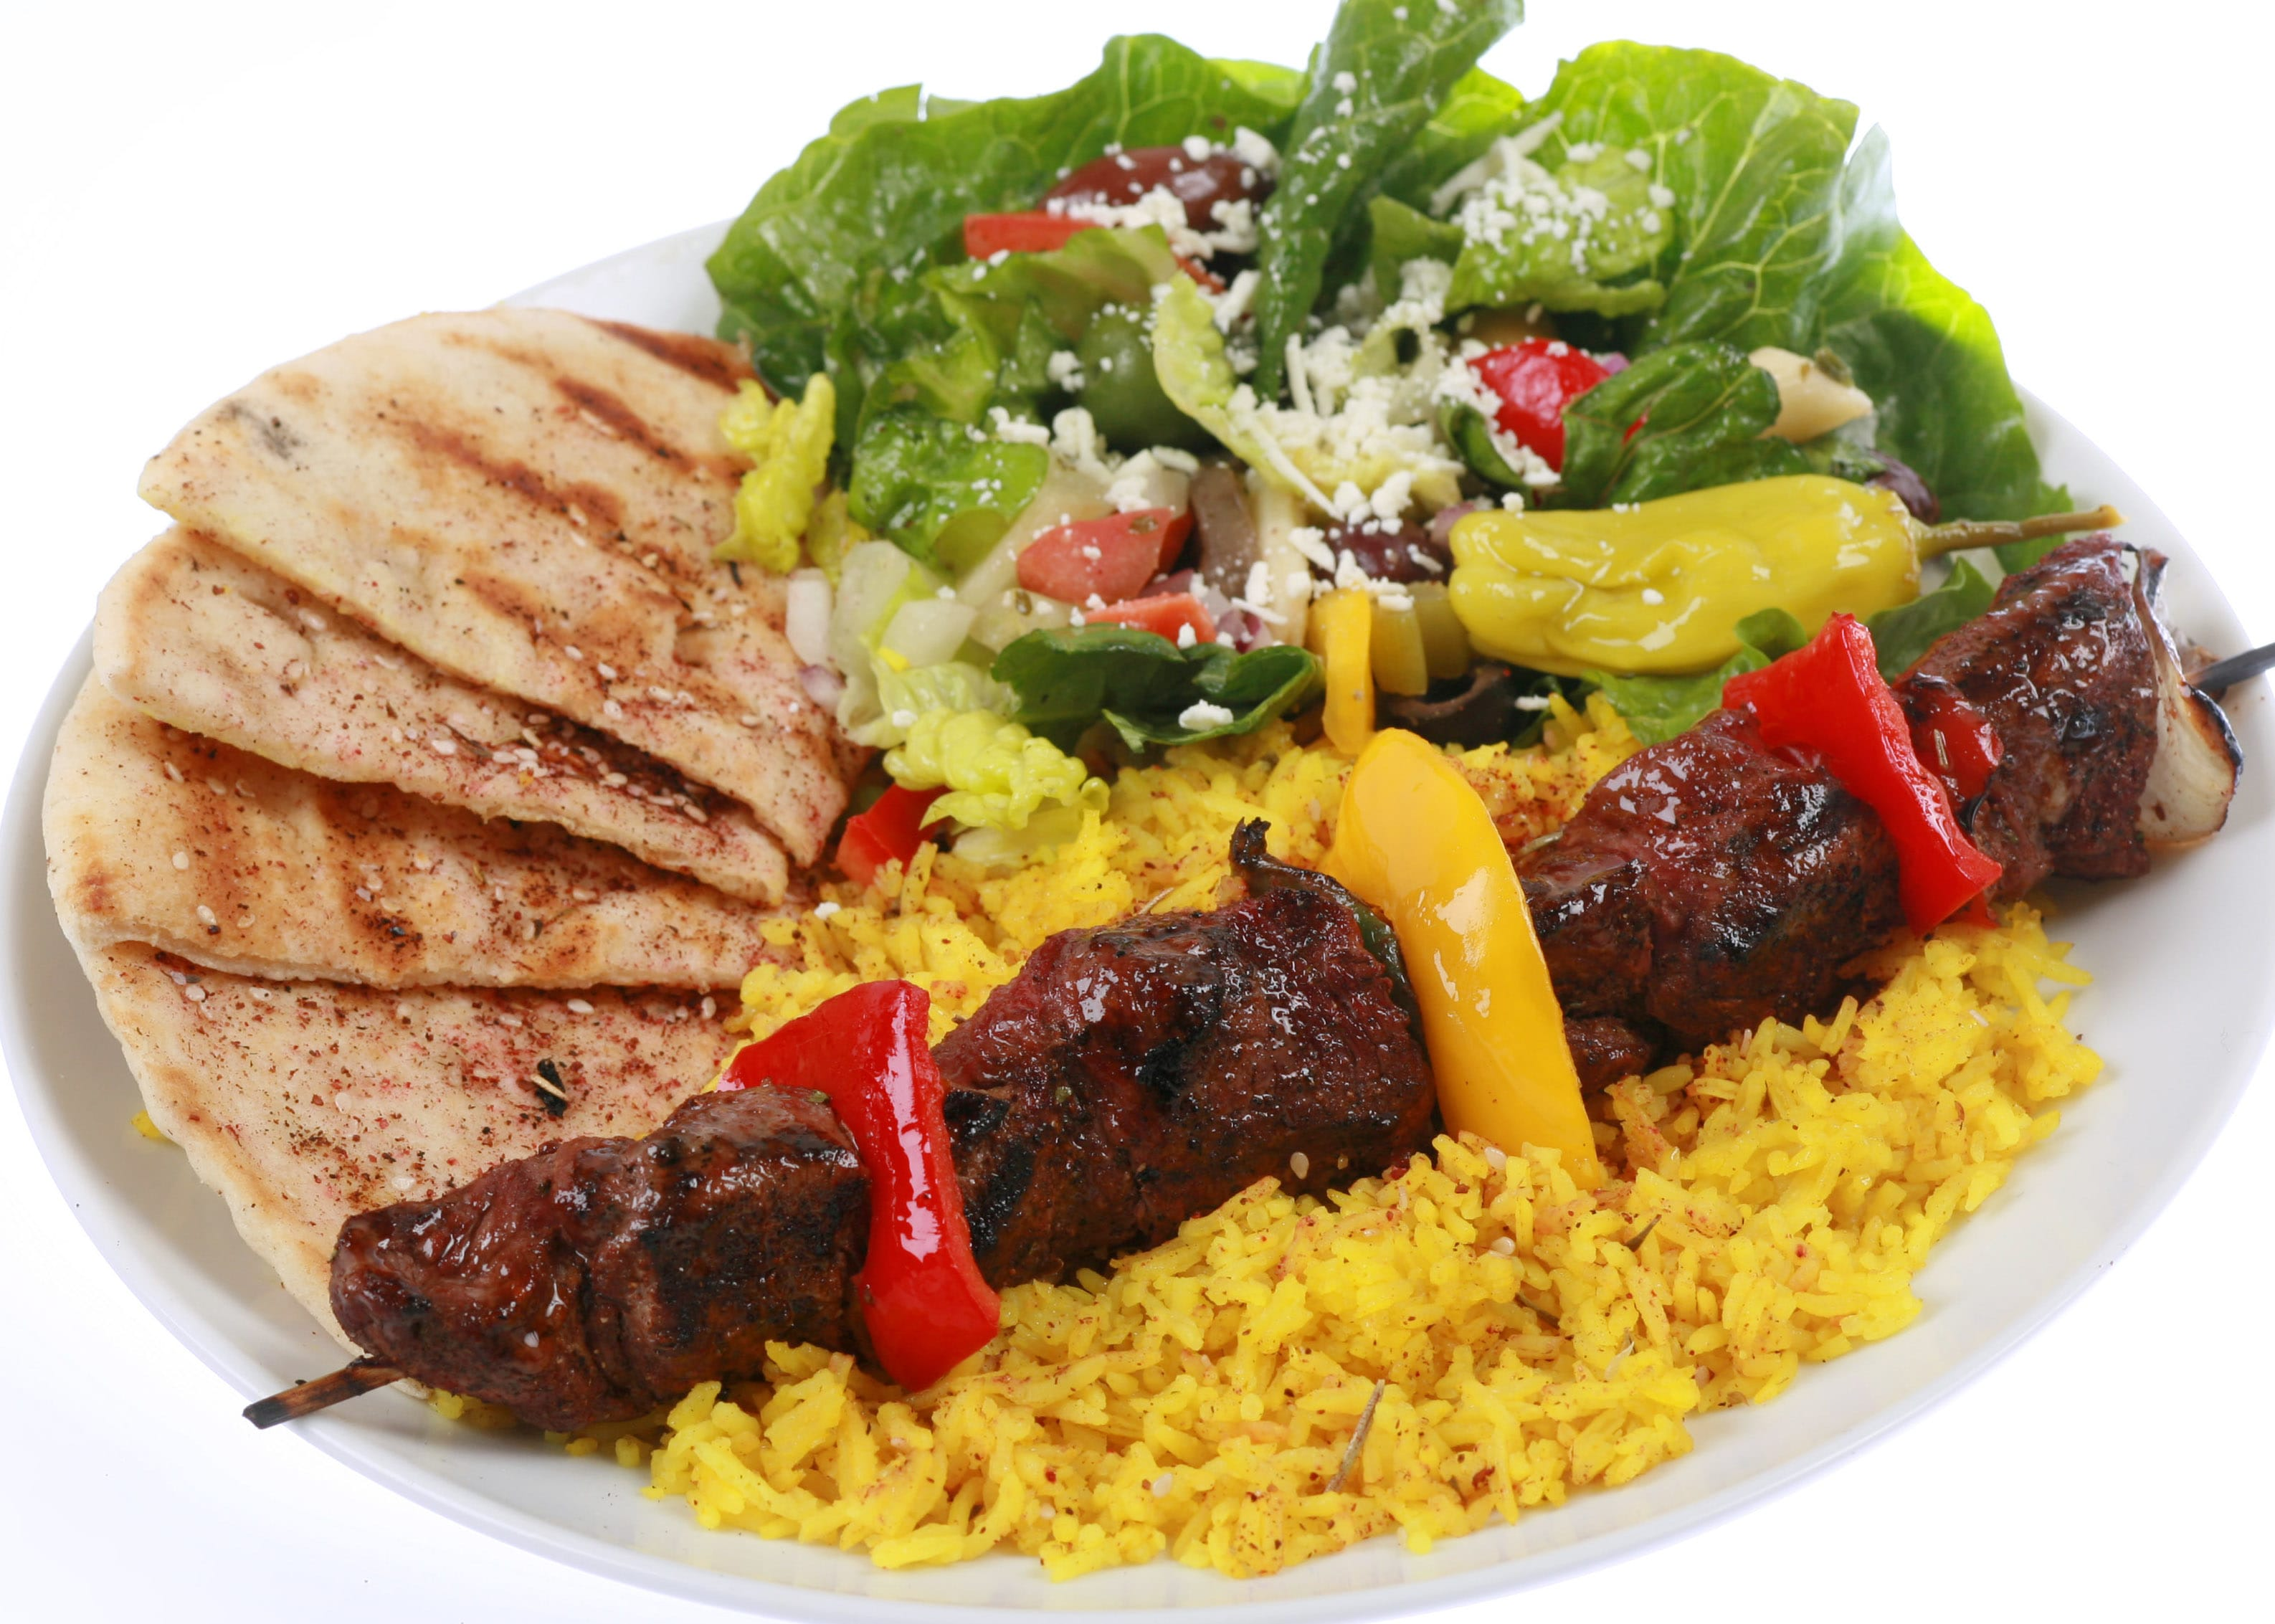 Beef kabob at Mediterranean Cafe